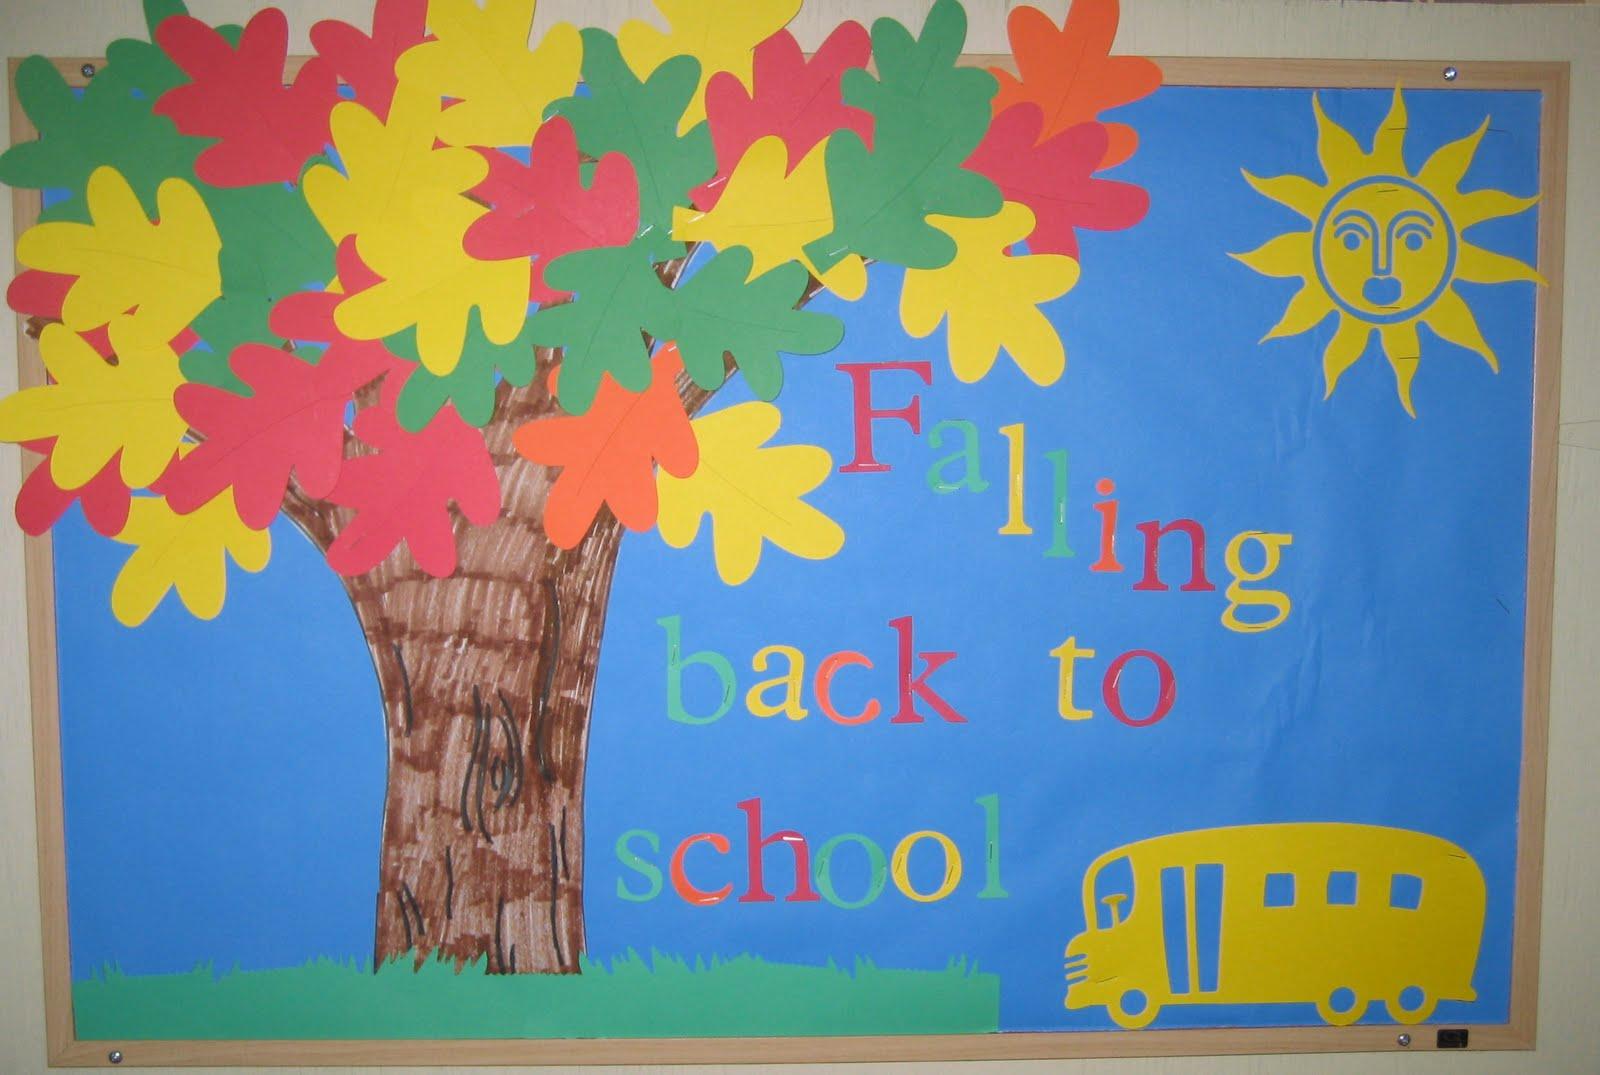 Christian Bulletin Board Ideas For Back To School